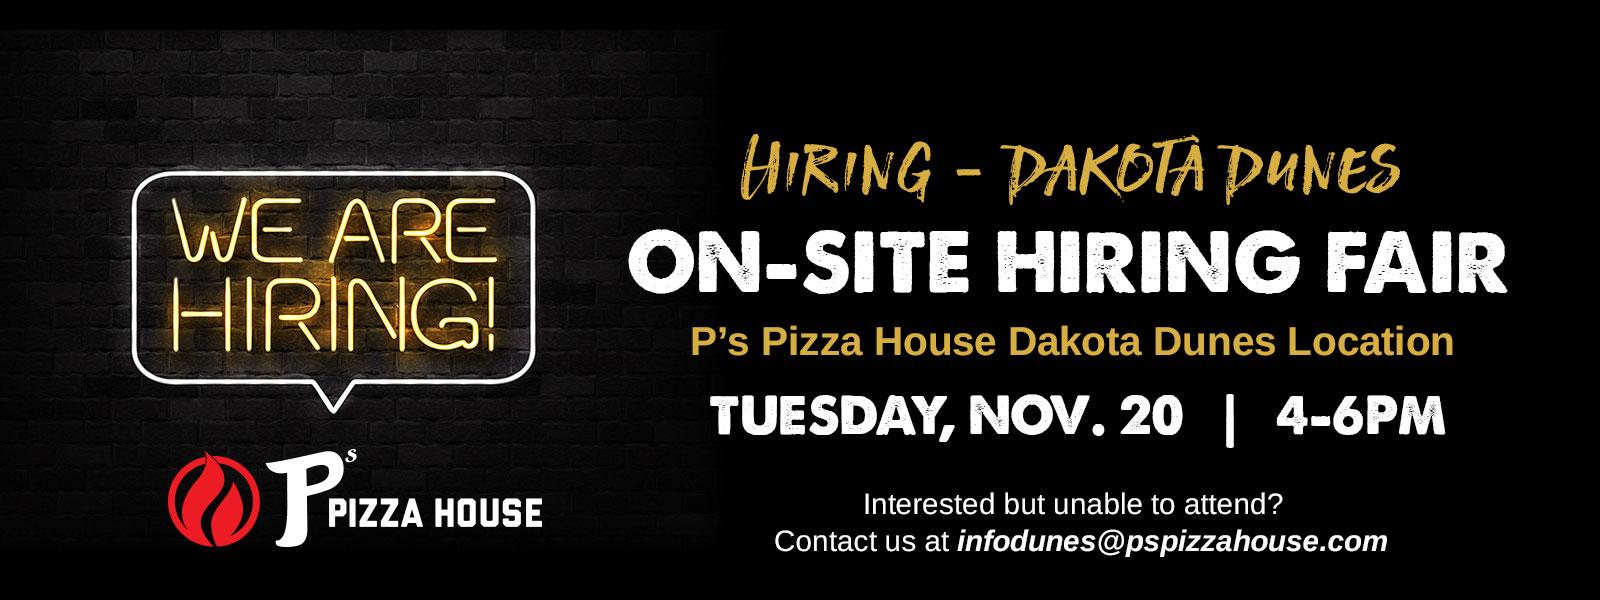 Jobs near Dakota Dunes, South Dakota - P's Pizza House - Now Hiring All Positions